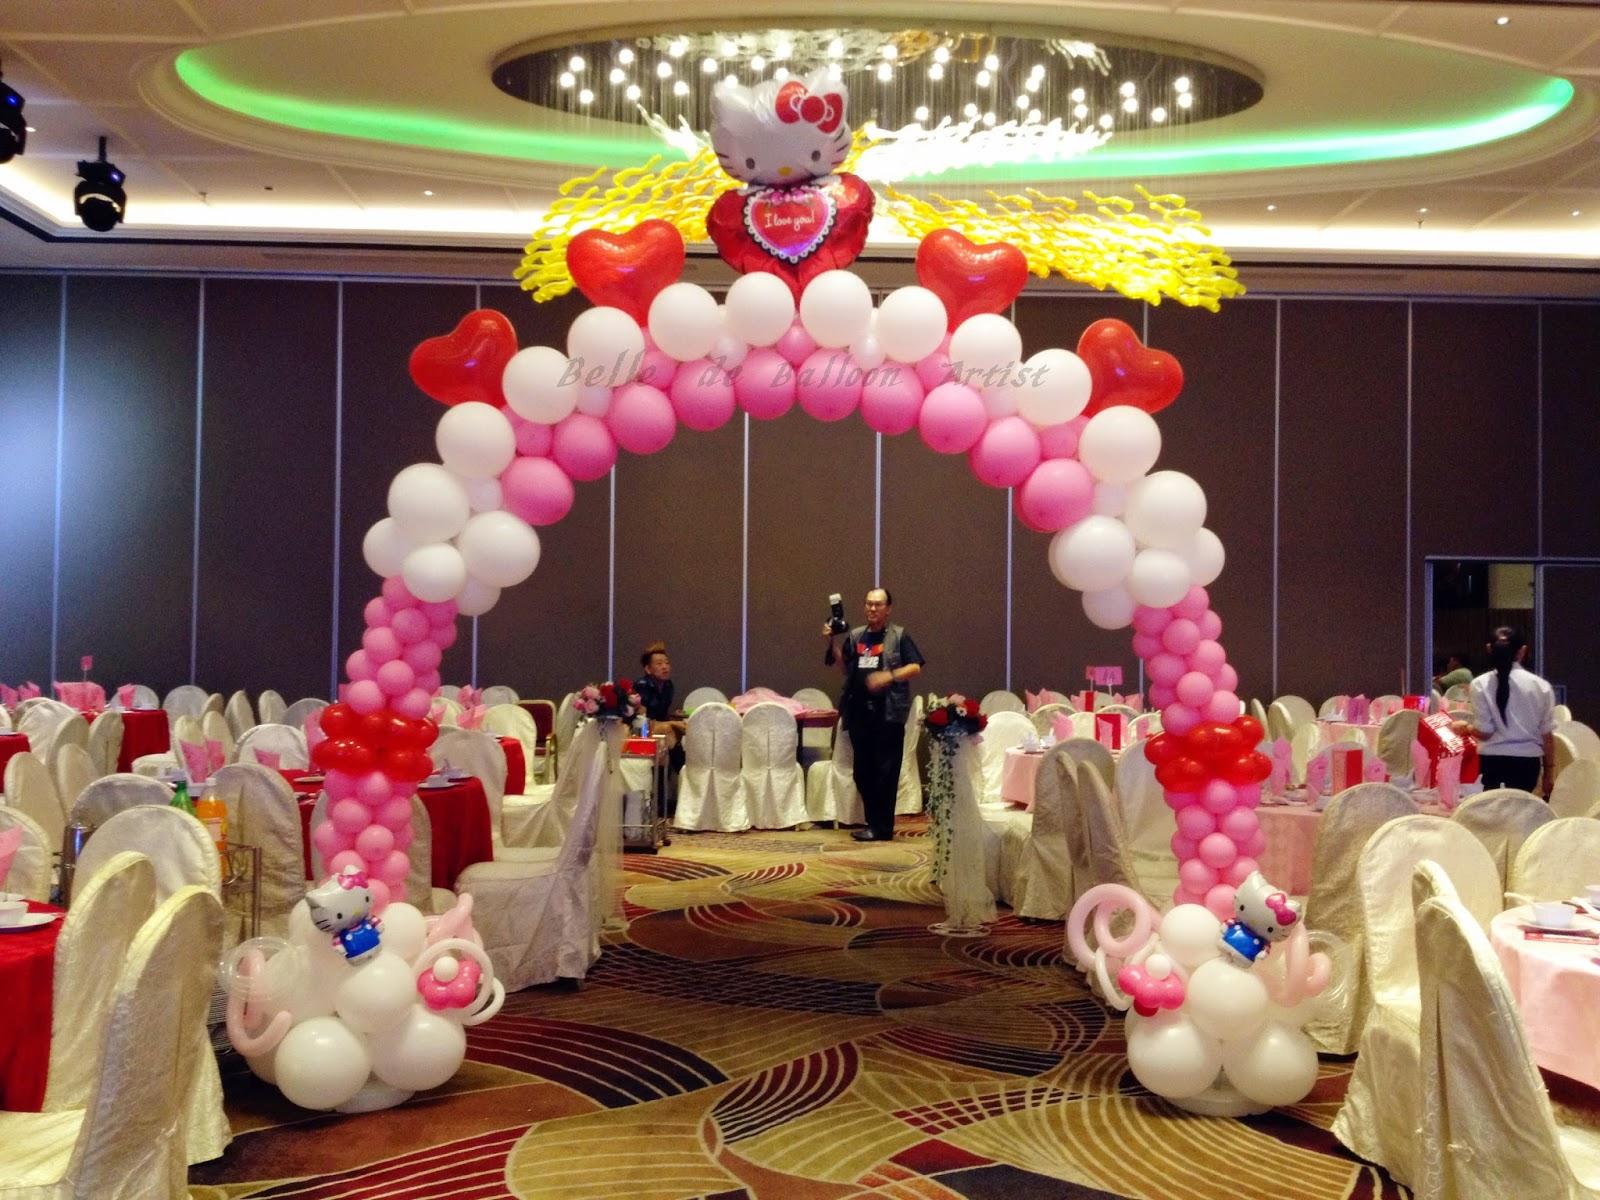 Belle de balloon artist hello kitty fans must view hello for Balloon decoration for wedding malaysia